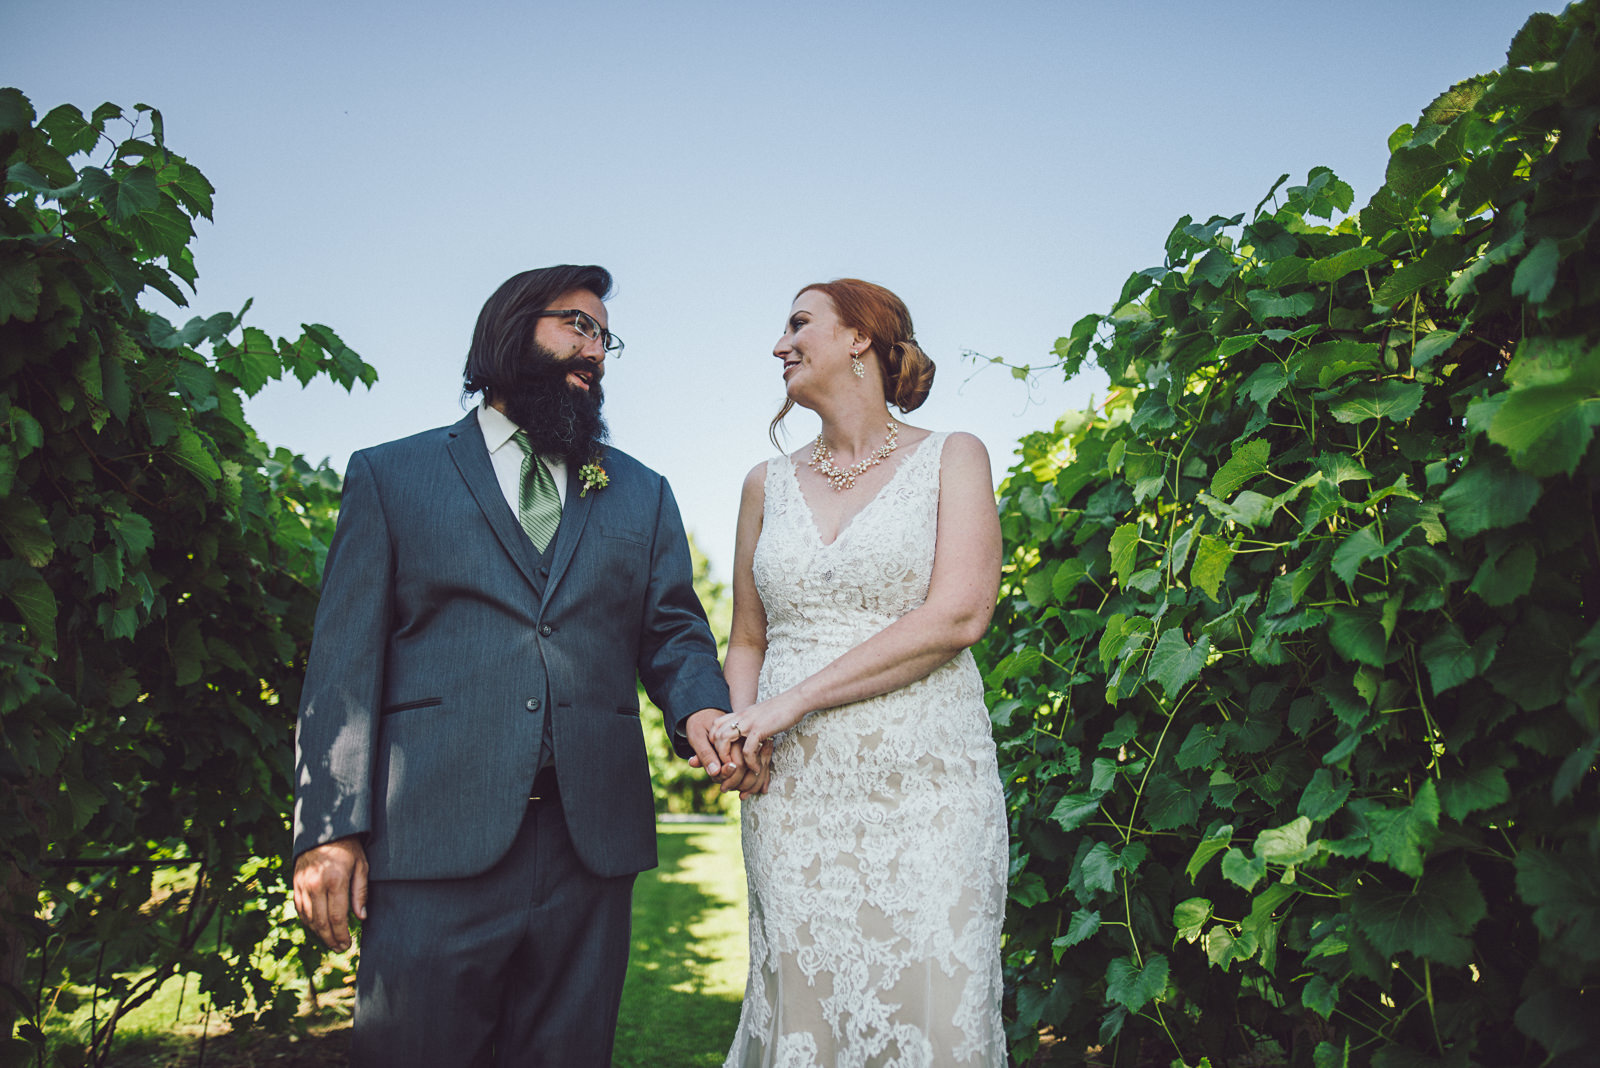 wedding-keely-caleb-266-name-your-photo.jpg